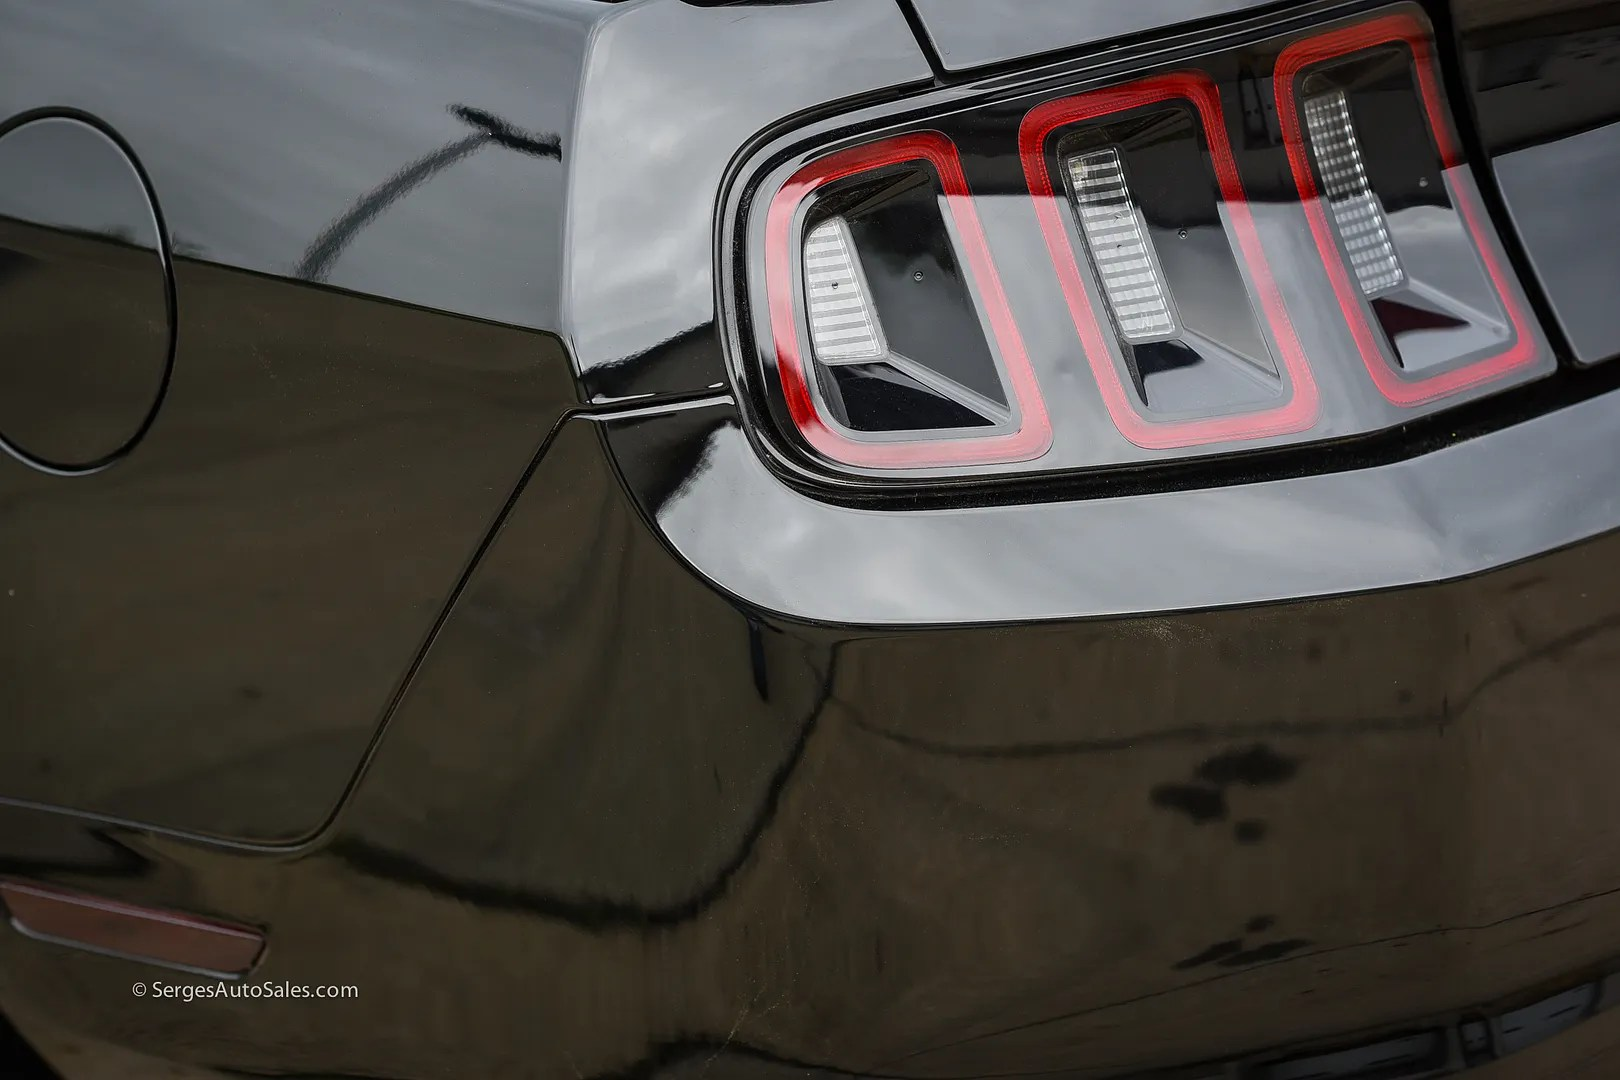 photo Serges-Auto-Sales-shelby-mustang-gt-for-sale-convertible-gt500-scranton-pa-37_zpsspbkzzgr.jpg